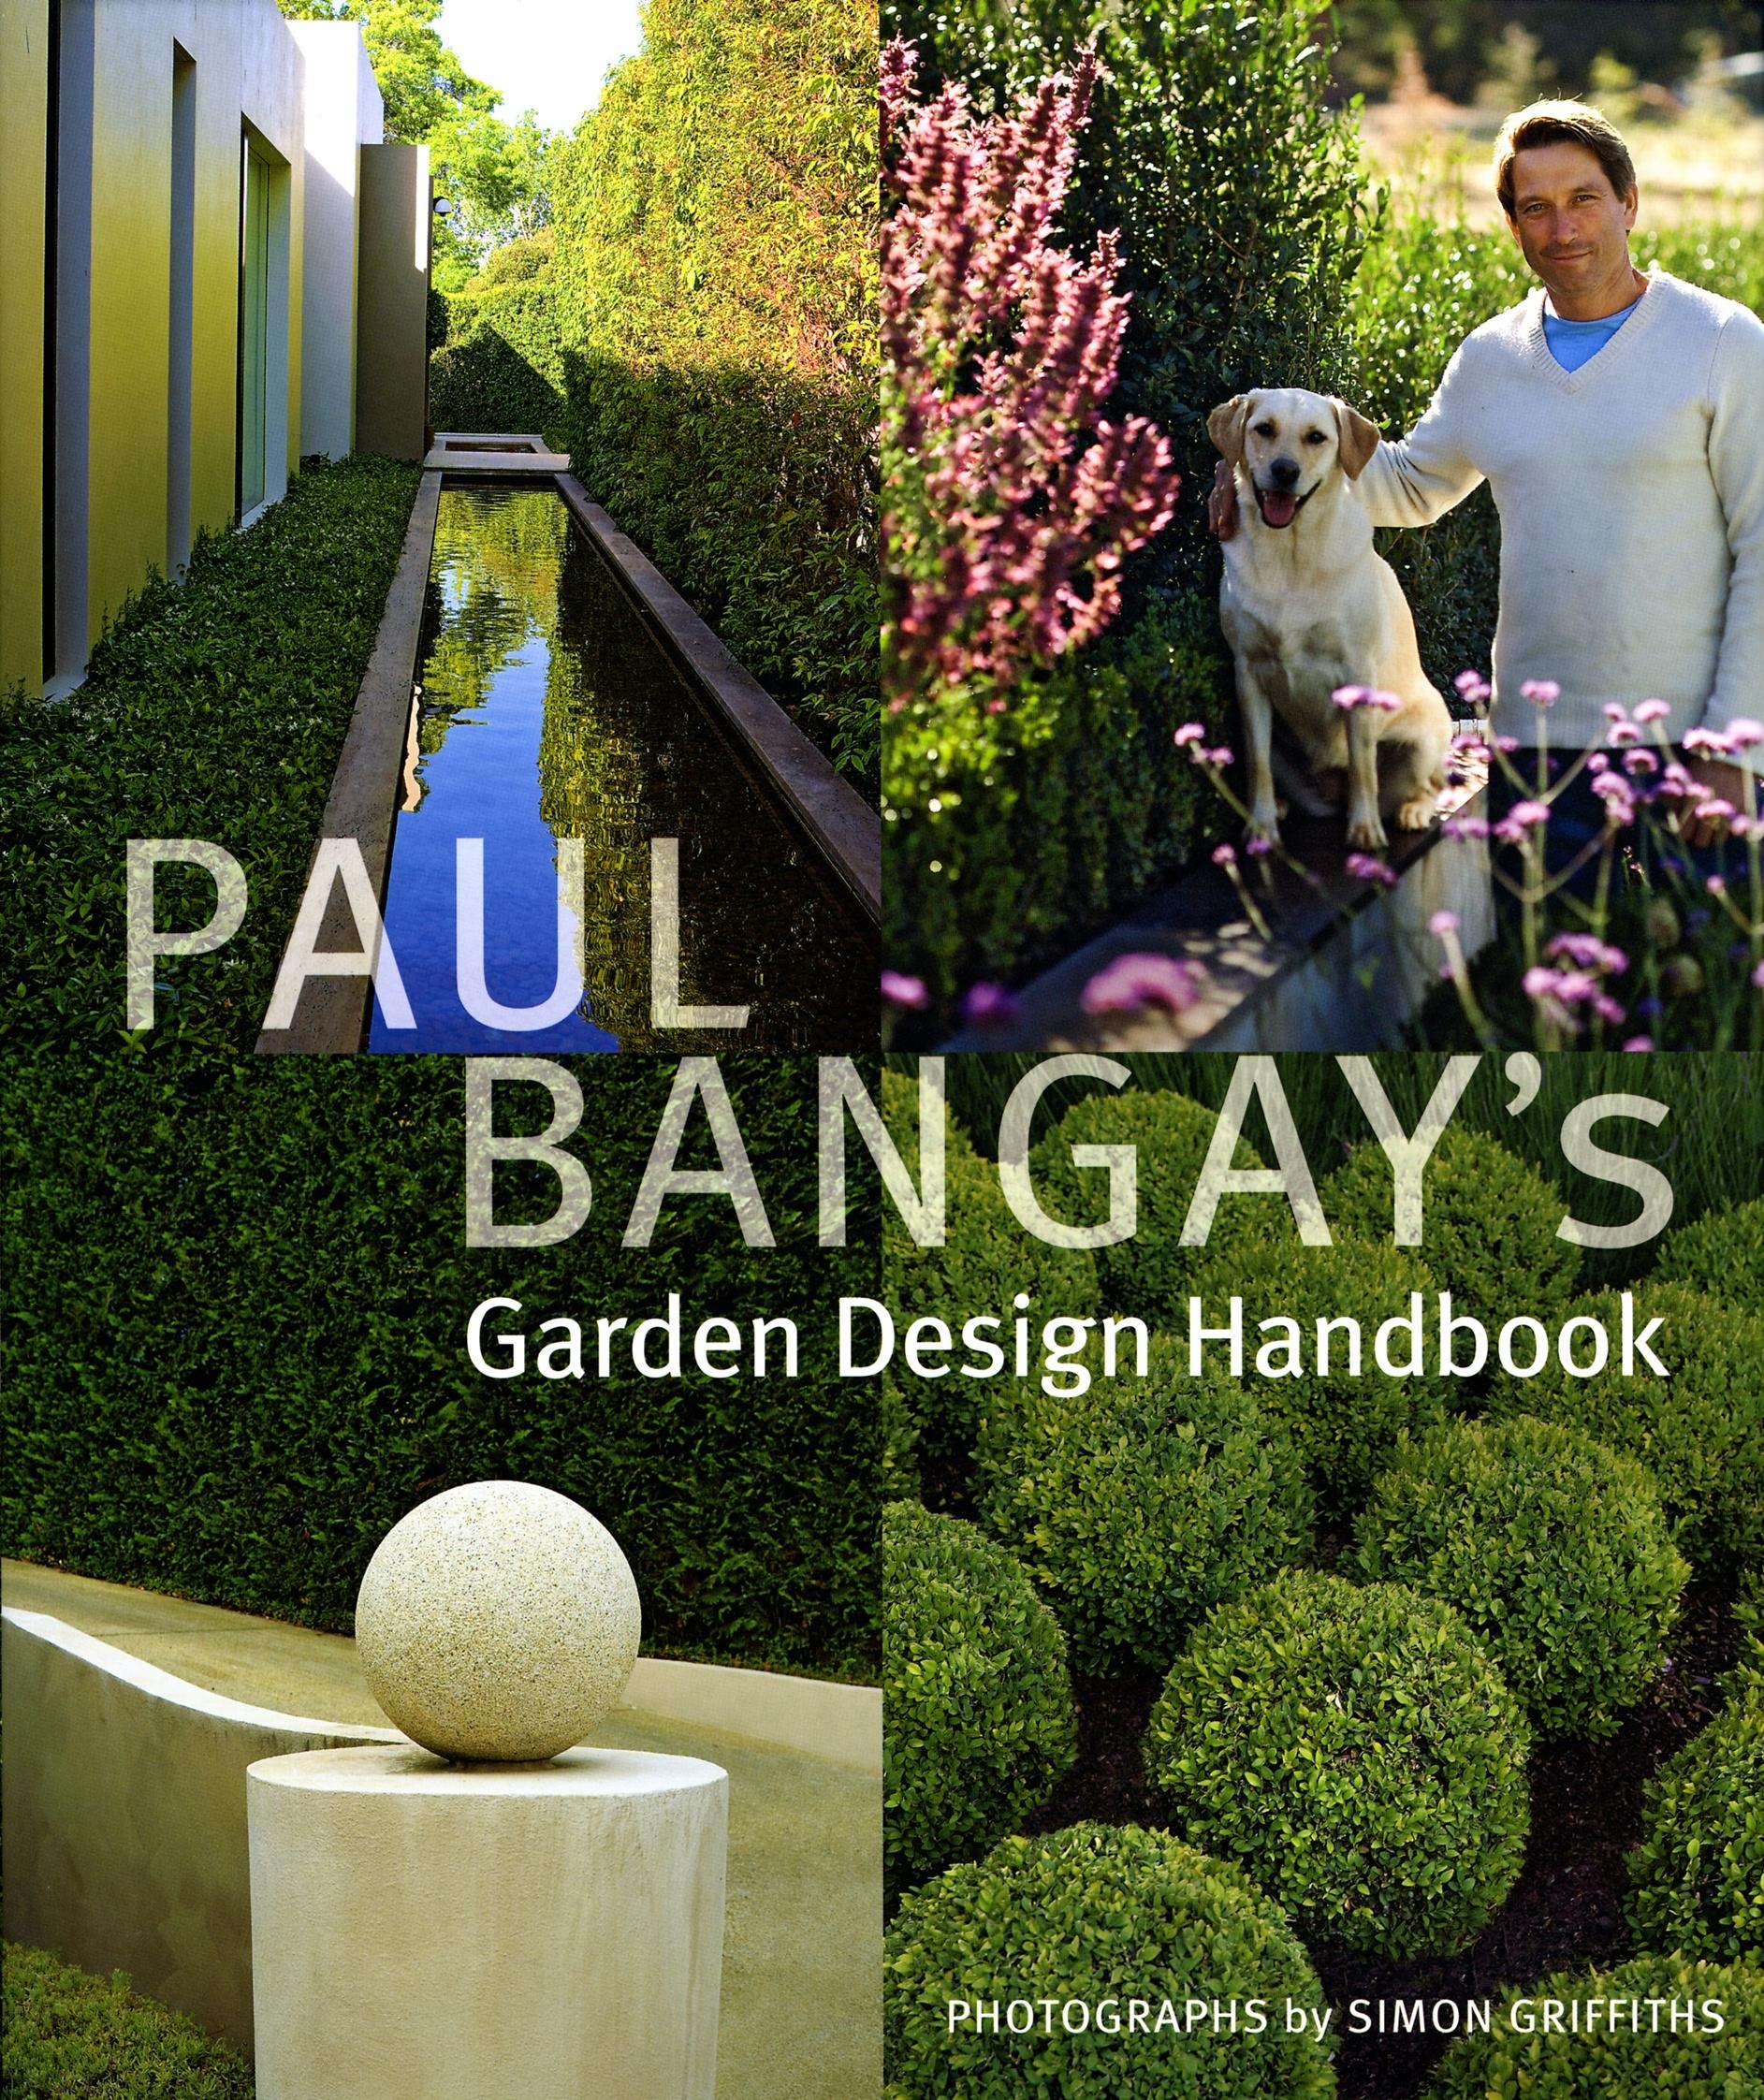 Paul Bangays Garden Design Handbook Penguin Books New Zealand